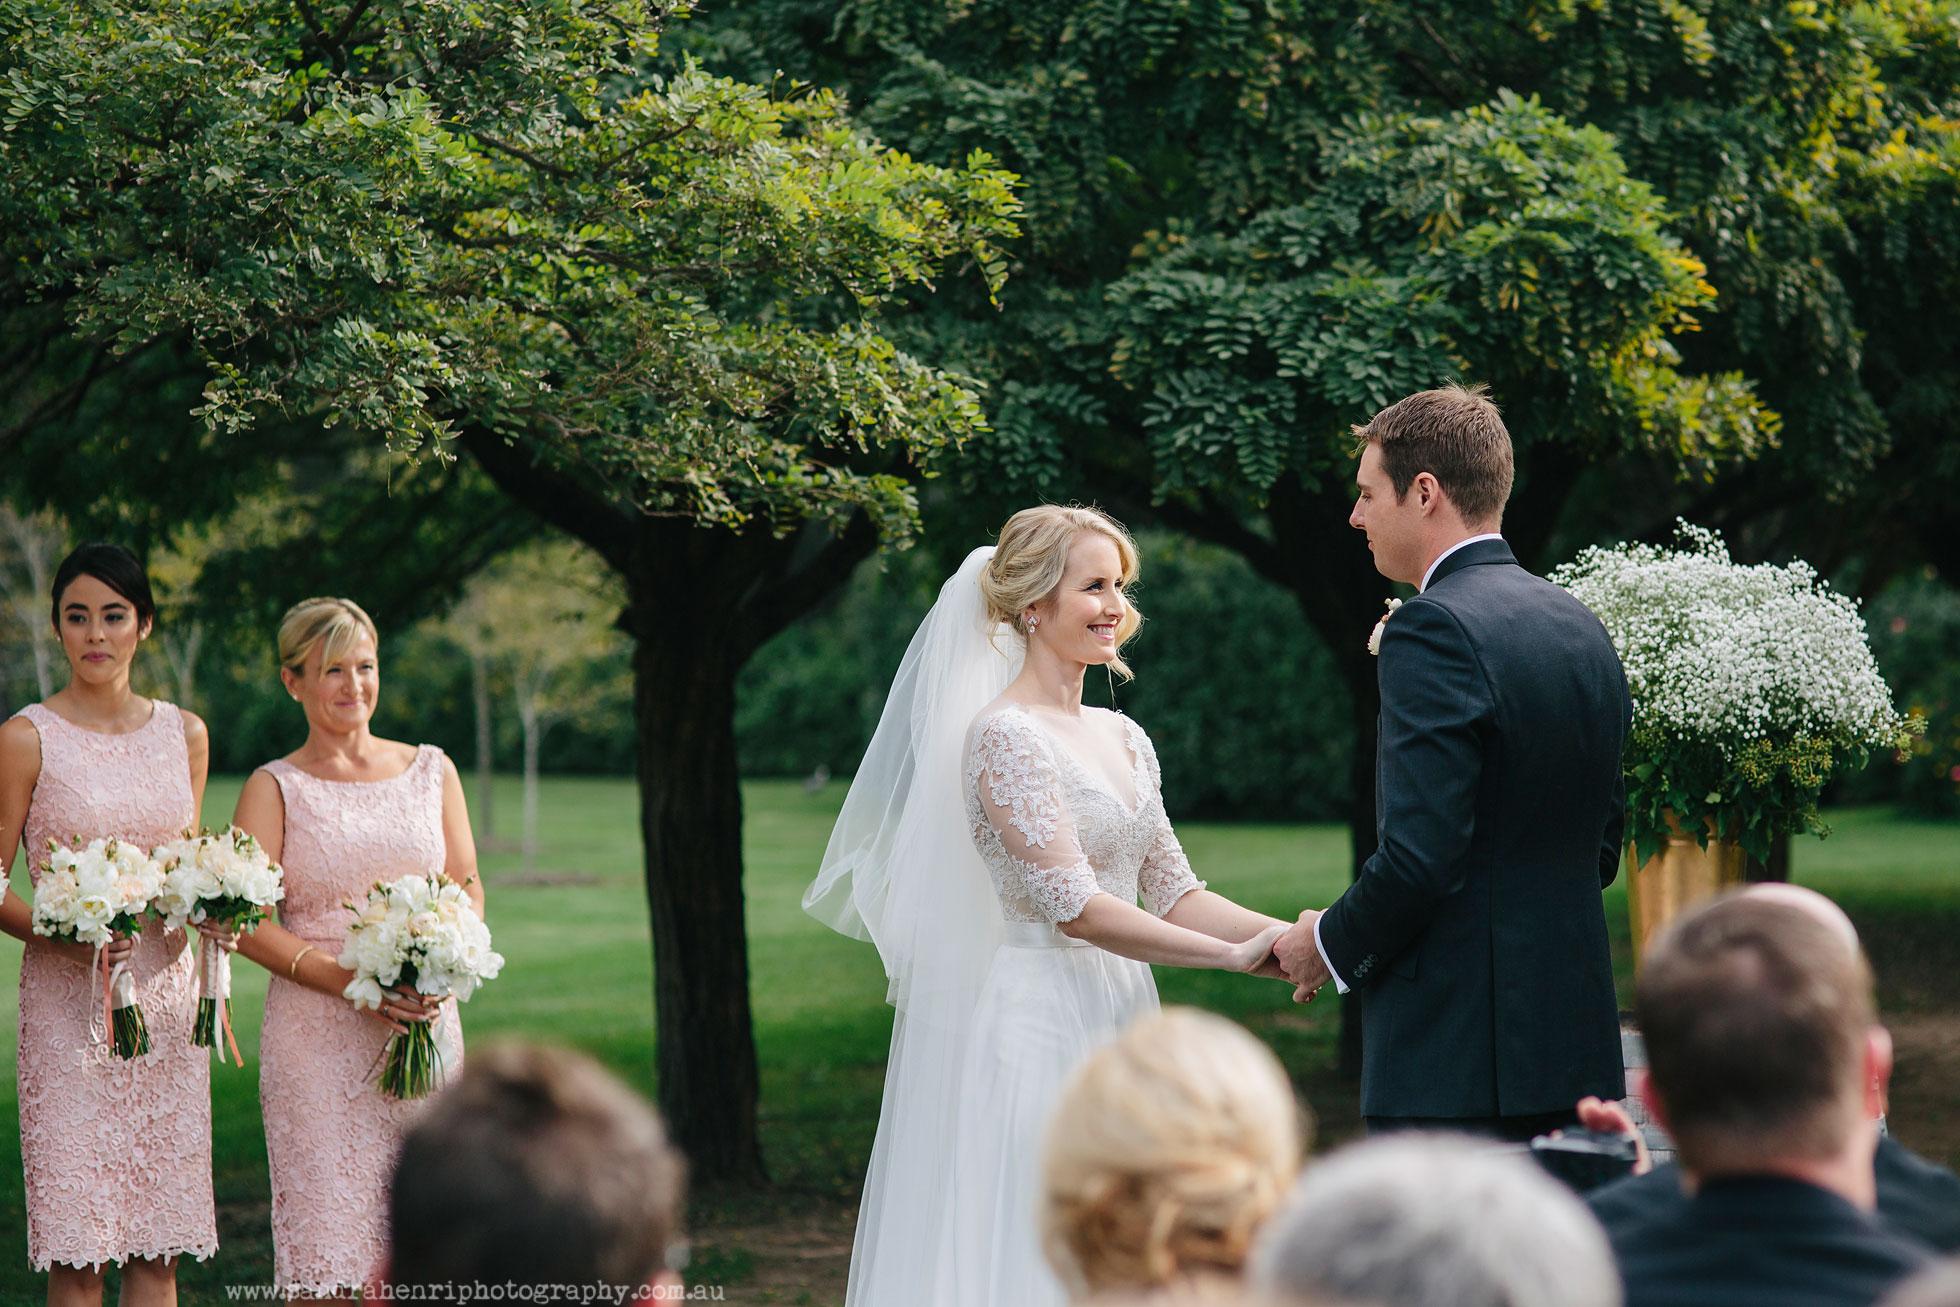 Roberts-Restaurant-garden-wedding-images-16.jpg